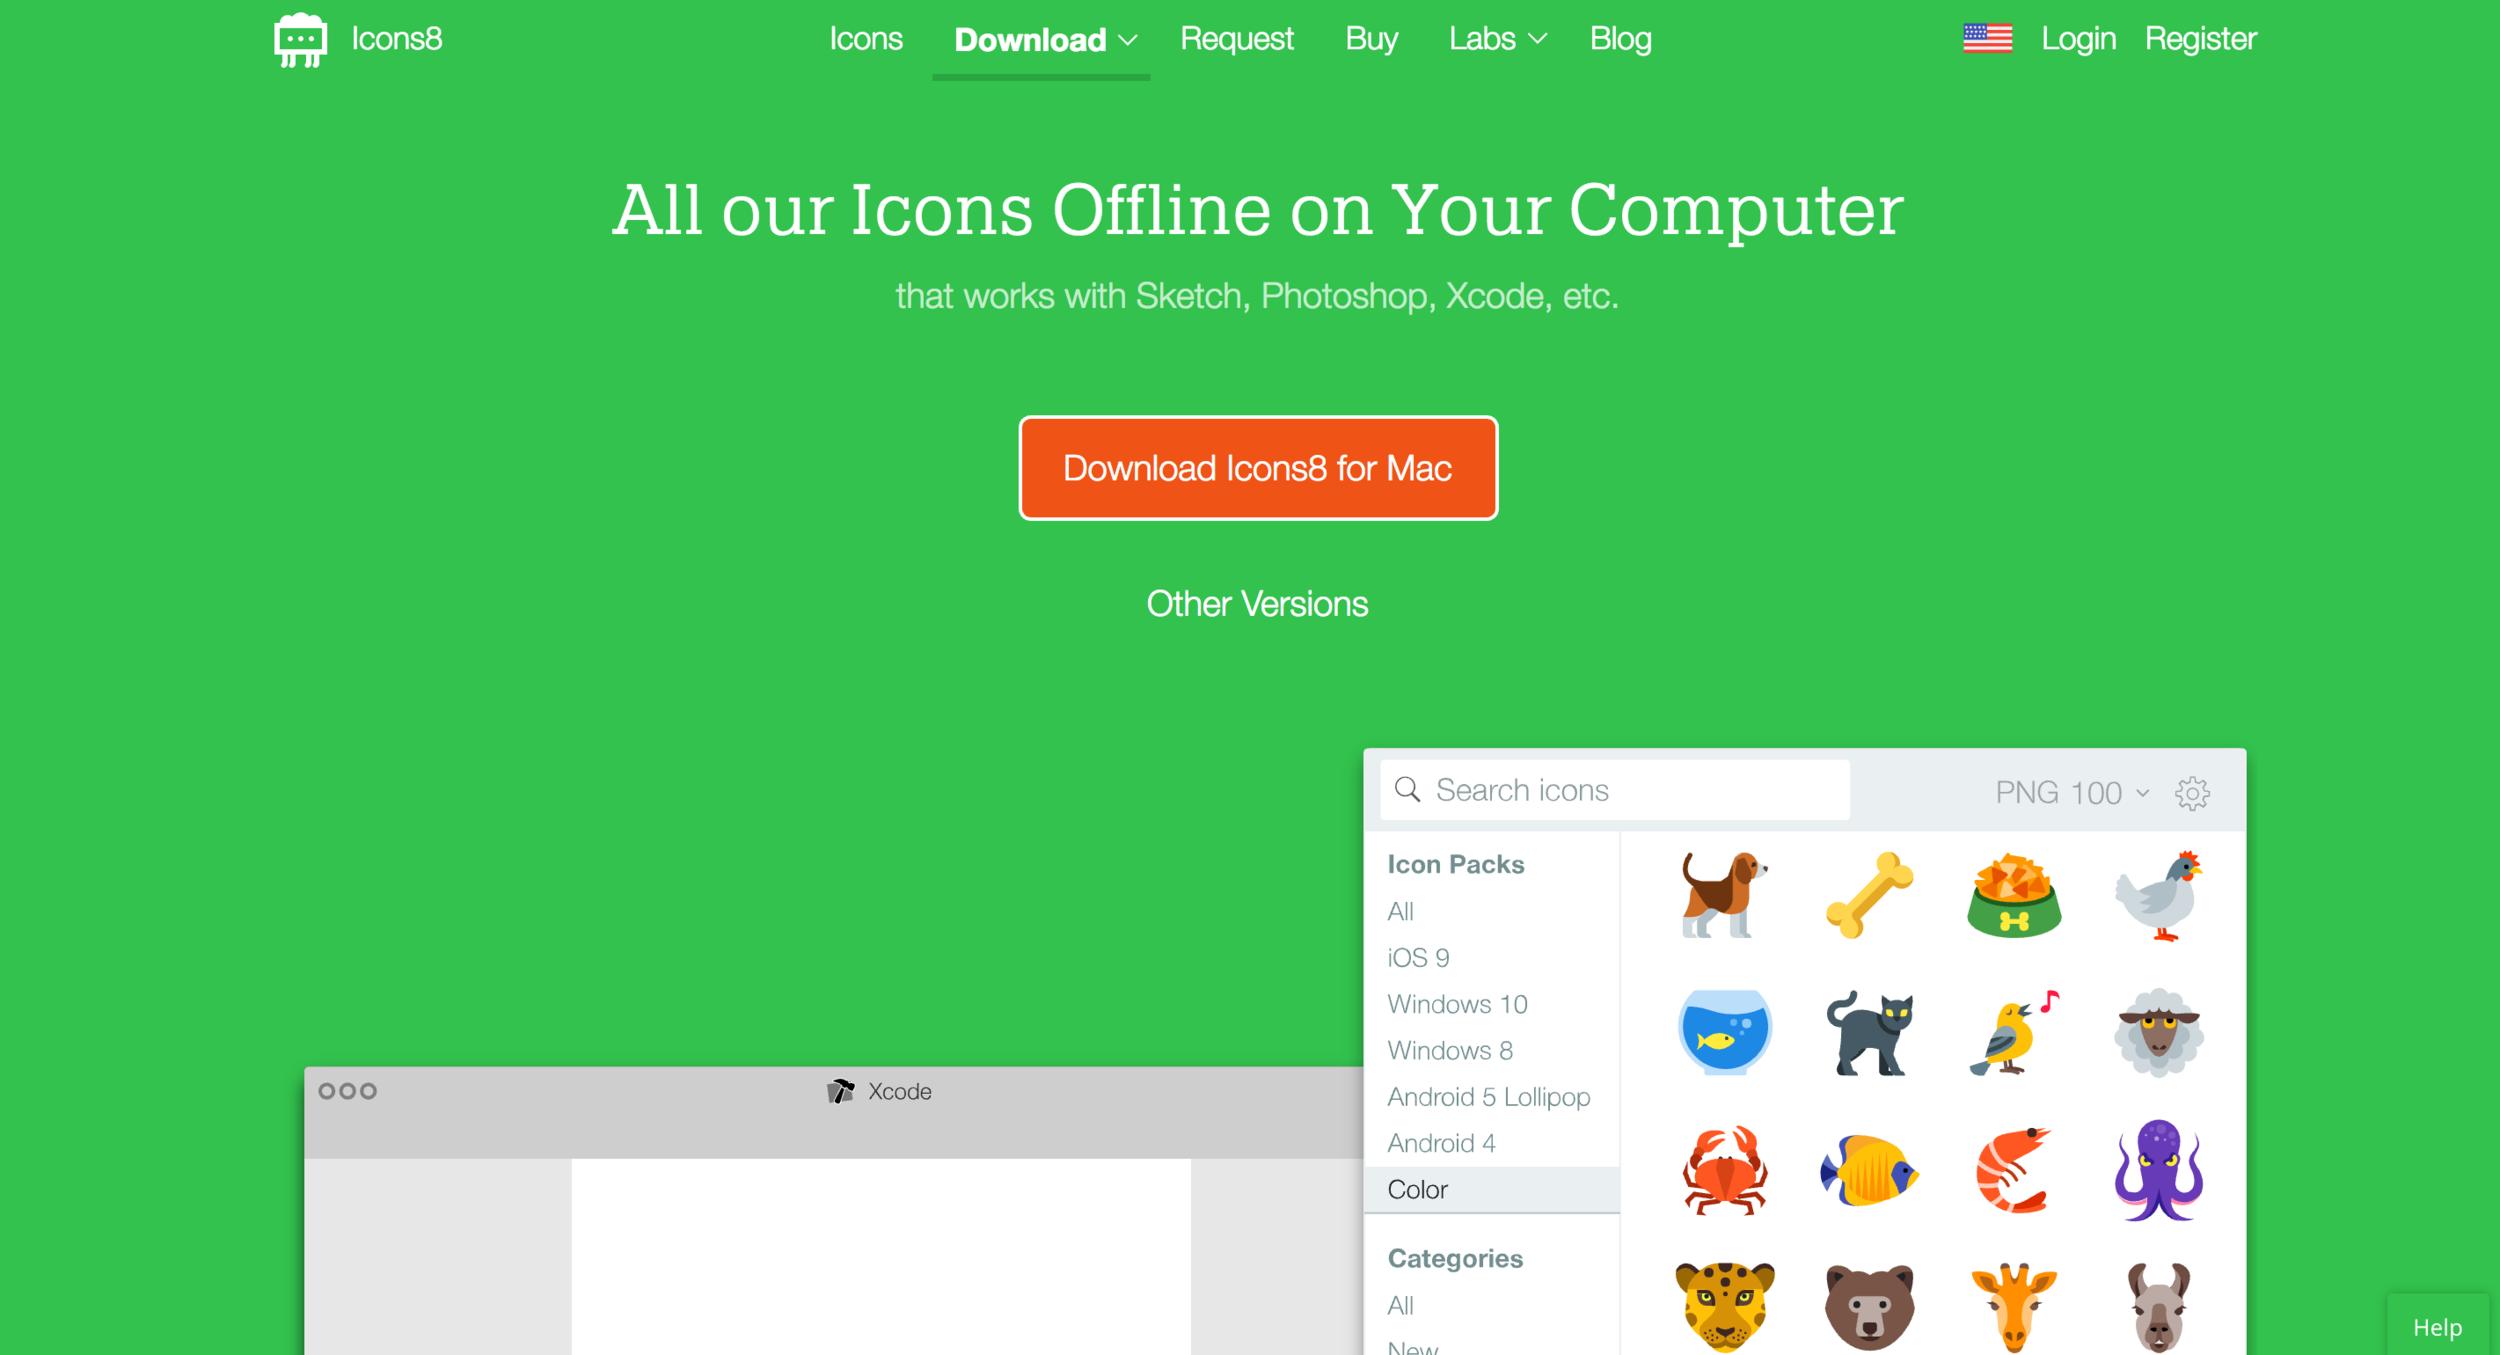 jacob-ruiz-design-blog-tools-icons-8